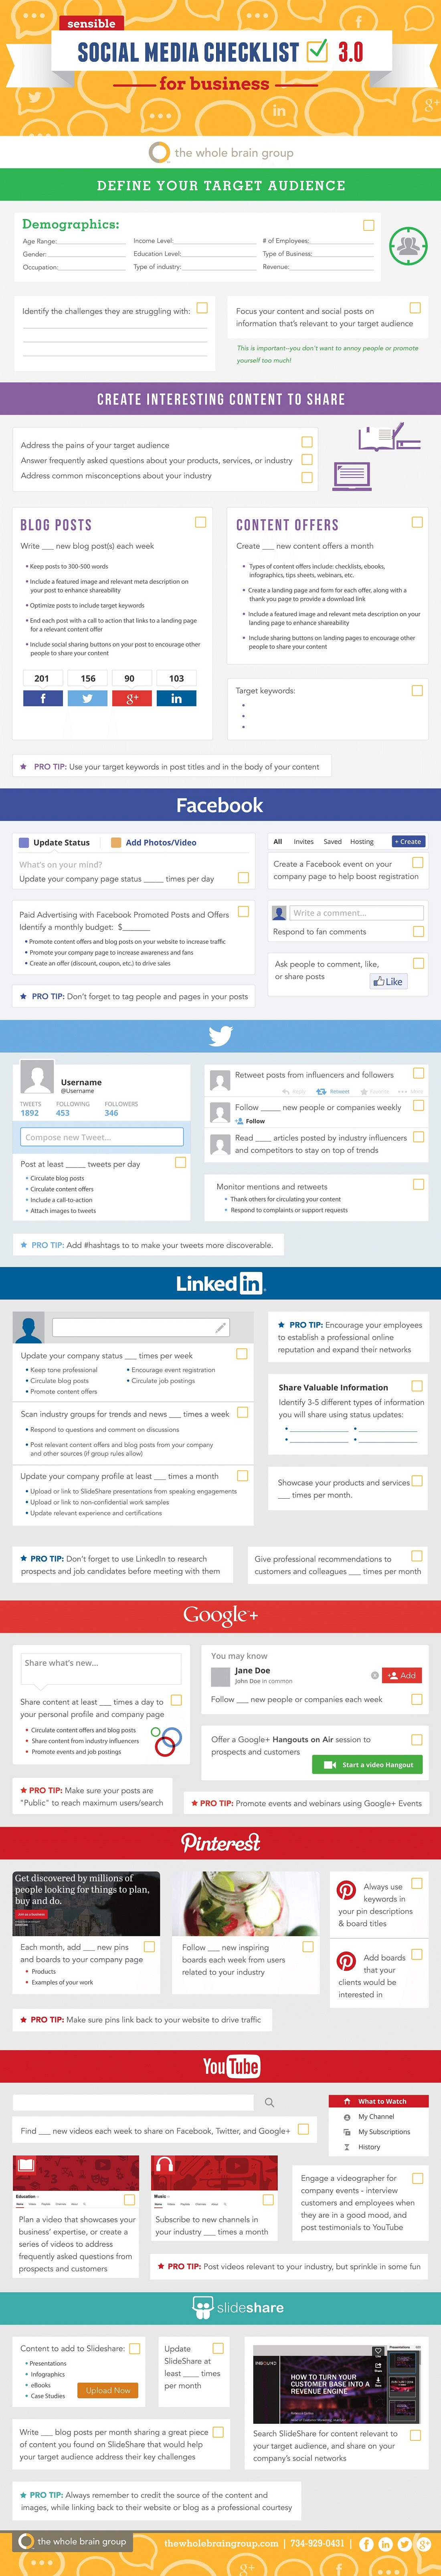 infografia checklist redes sociales negocios